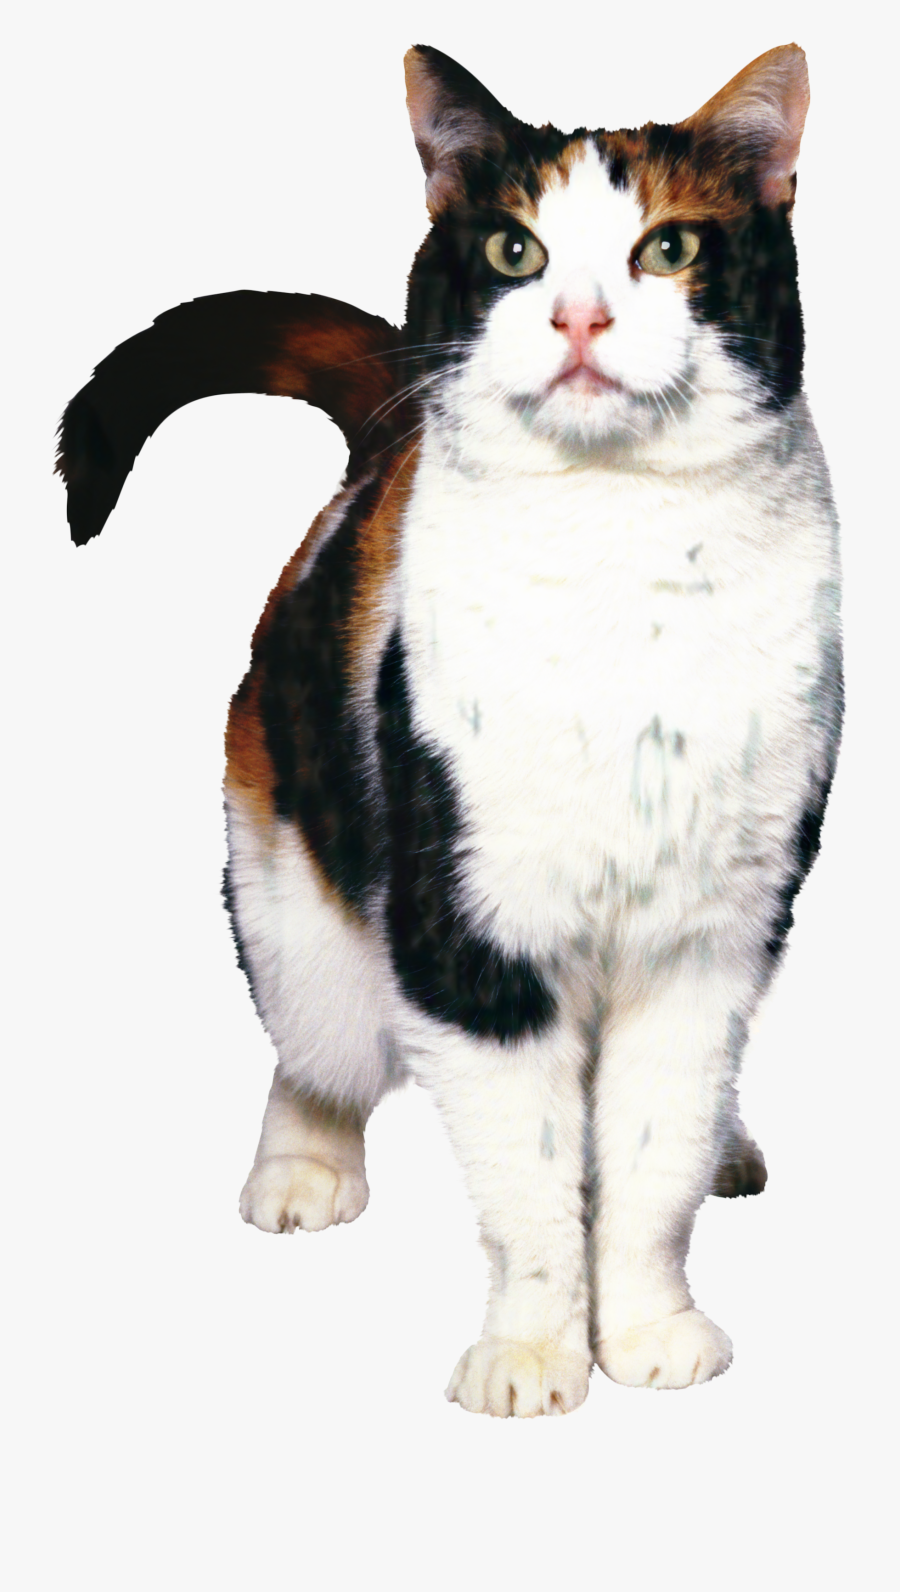 Cat Food Dog Kitten Norwegian Forest Cat Pet - Cat And Dog, Transparent Clipart